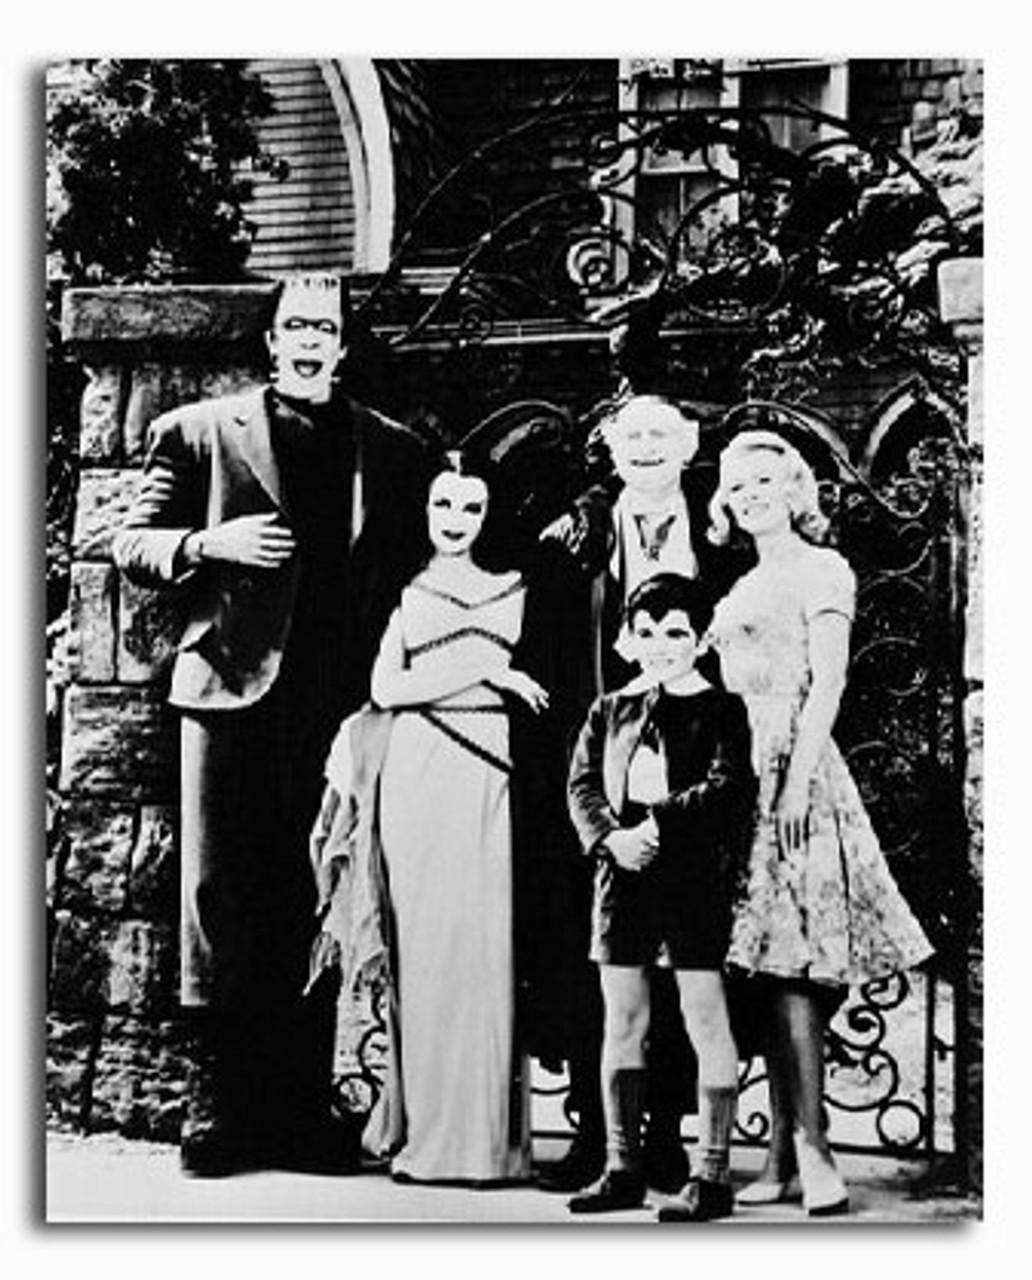 BRAND NEW THE MUNSTERS HERMAN LILY GRANDPA EDDIE MARILYN MUNSTER BLACK T SHIRT